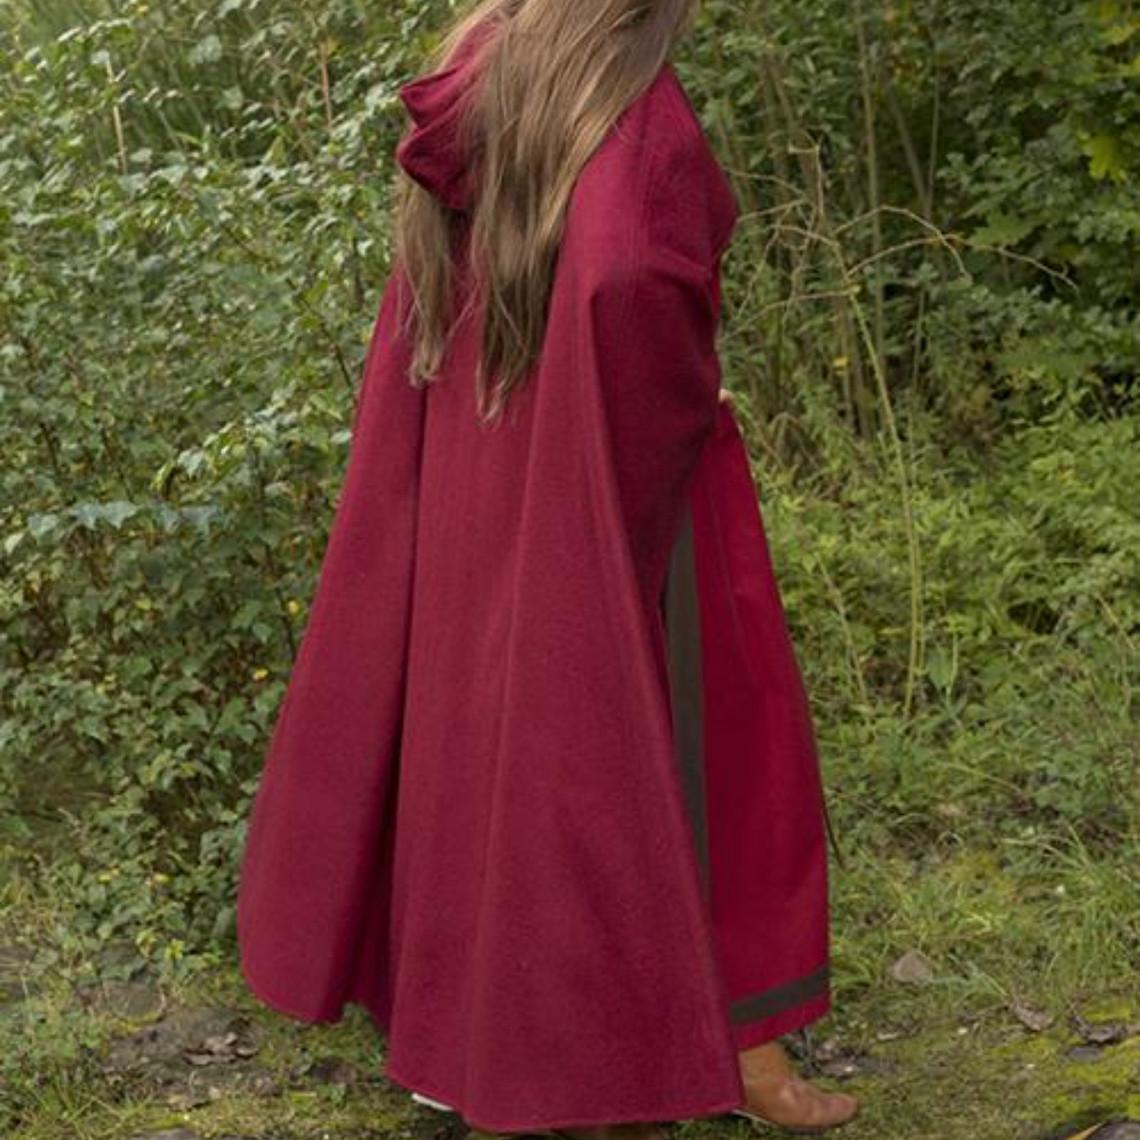 Epic Armoury Wollen reismantel rood